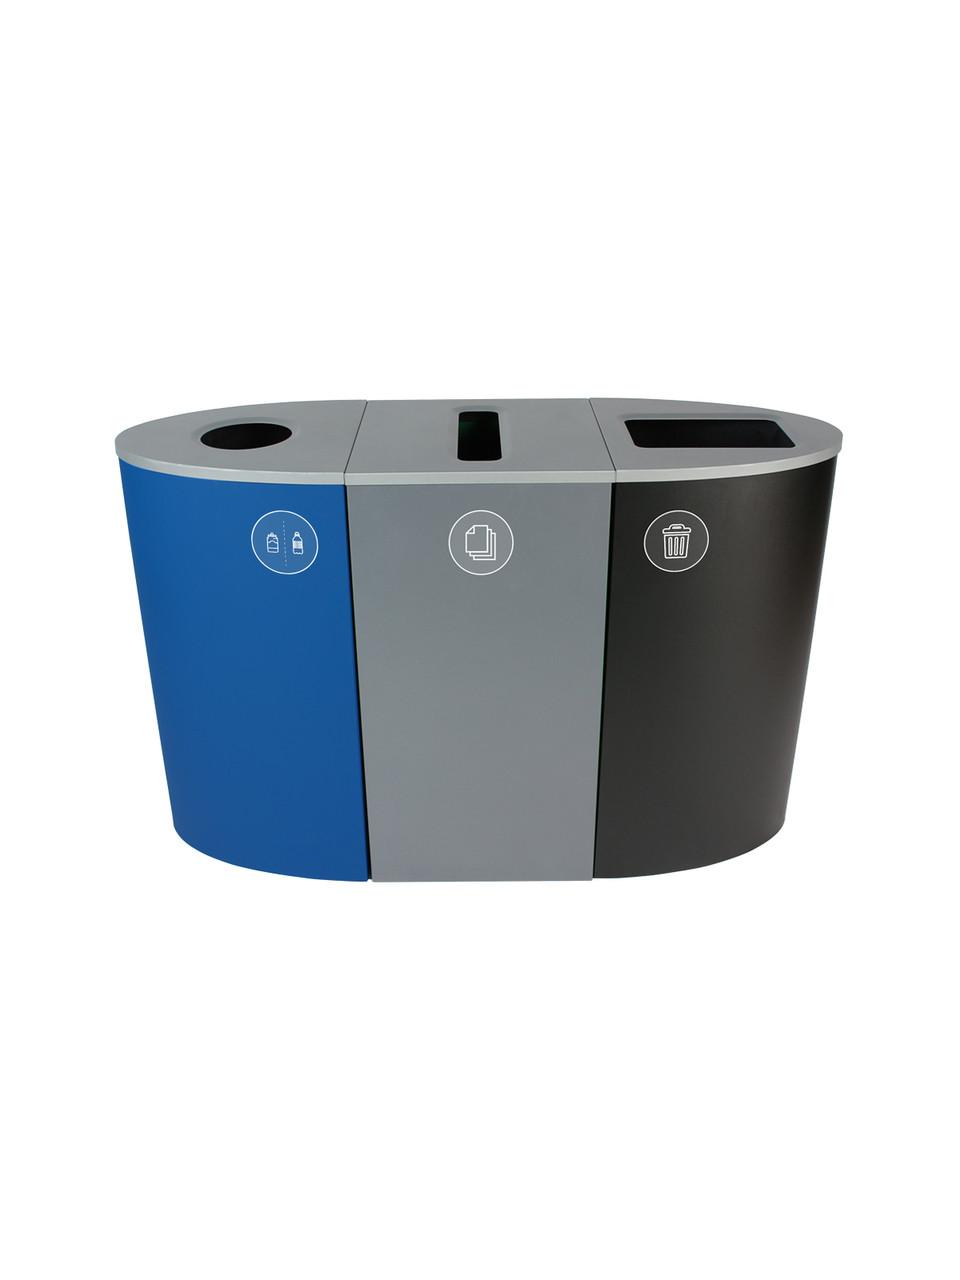 68 Gallon Spectrum Triple Recycling Station Blue/Gray/Black 8107102-134